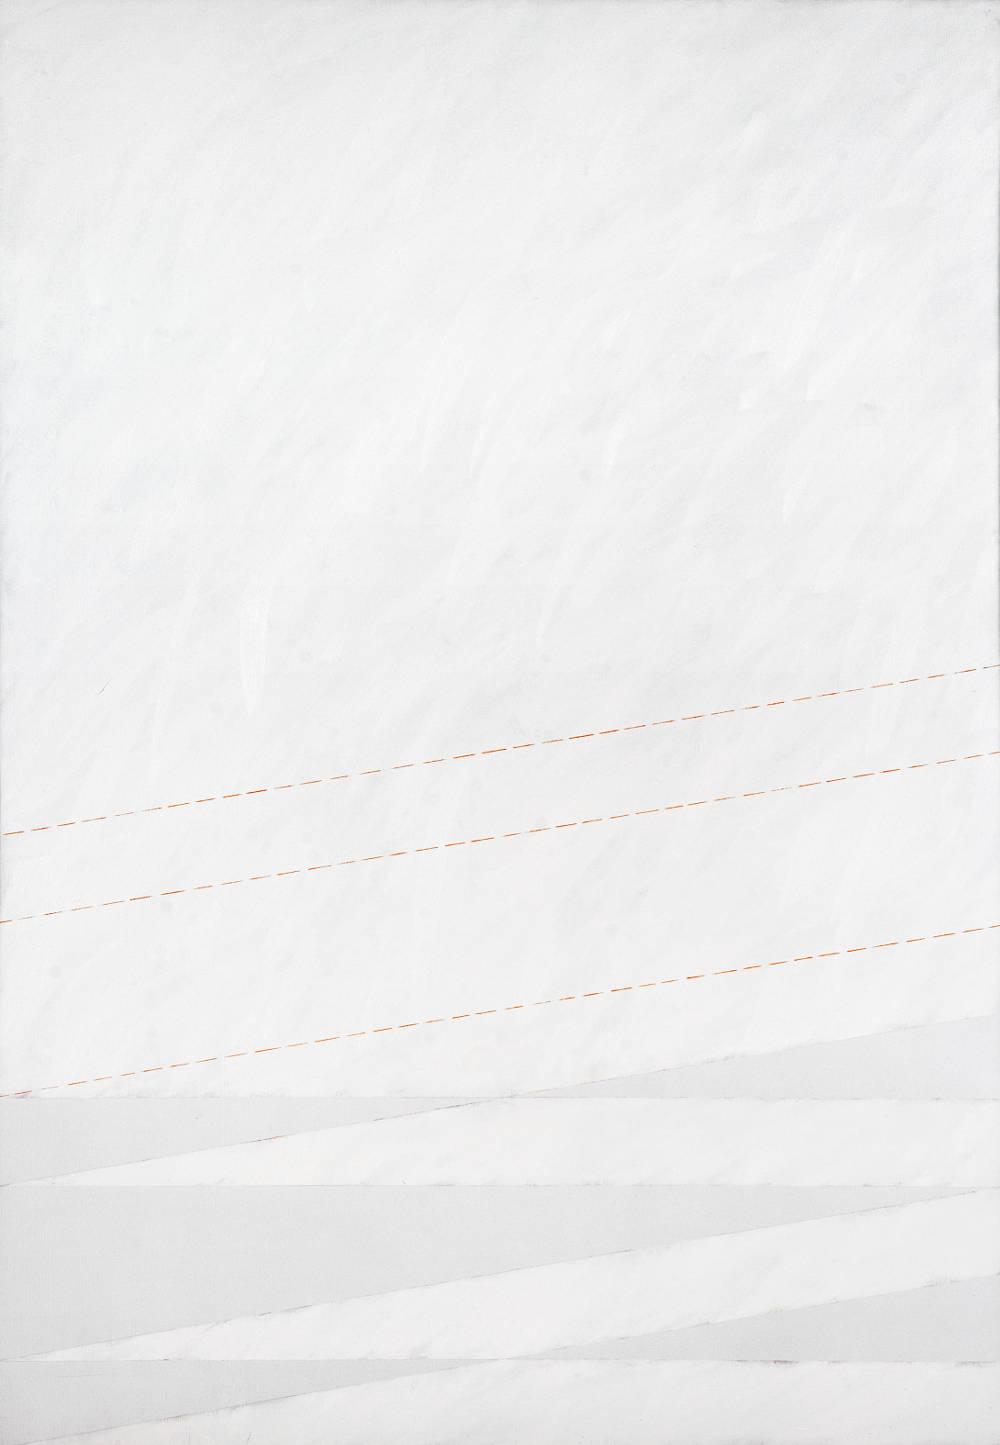 Claudio Verna, Bianco obliquo II, 1976. Oil on canvas 200 x 140 cm 78.7 x 55.1 inch.